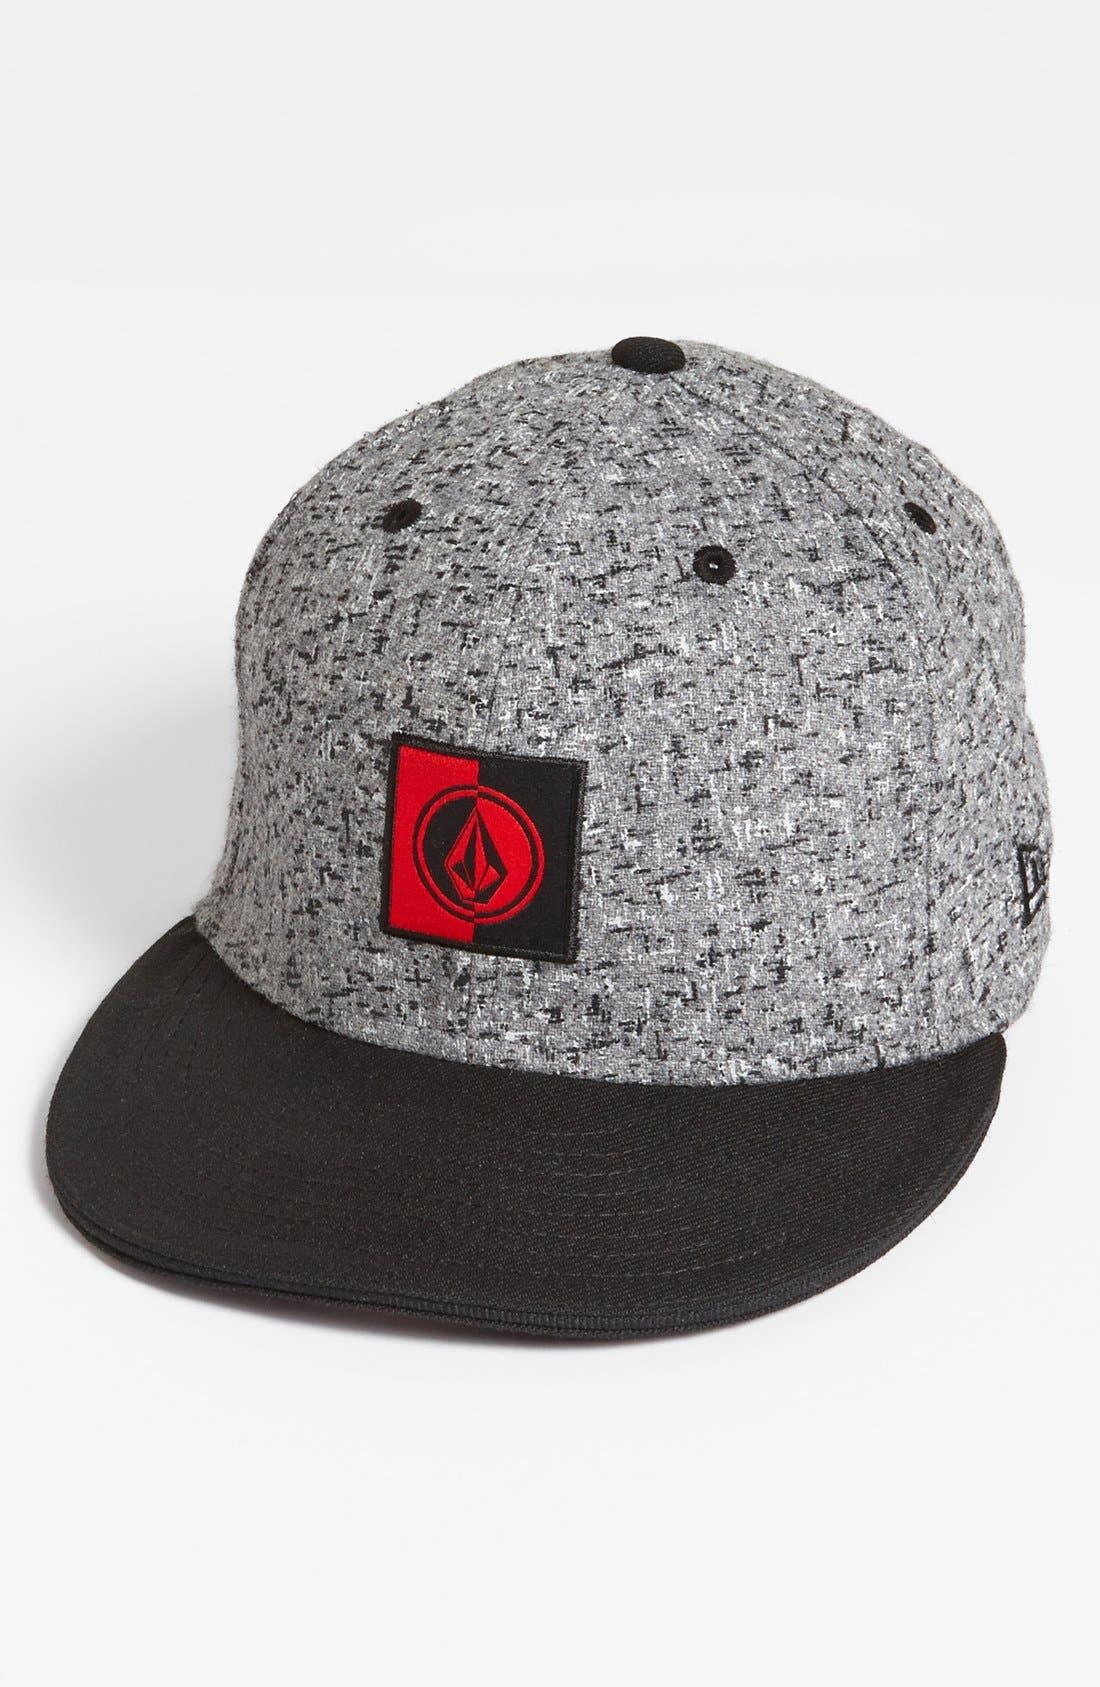 Main Image - Volcom 'Embrace' Snapback Baseball Cap